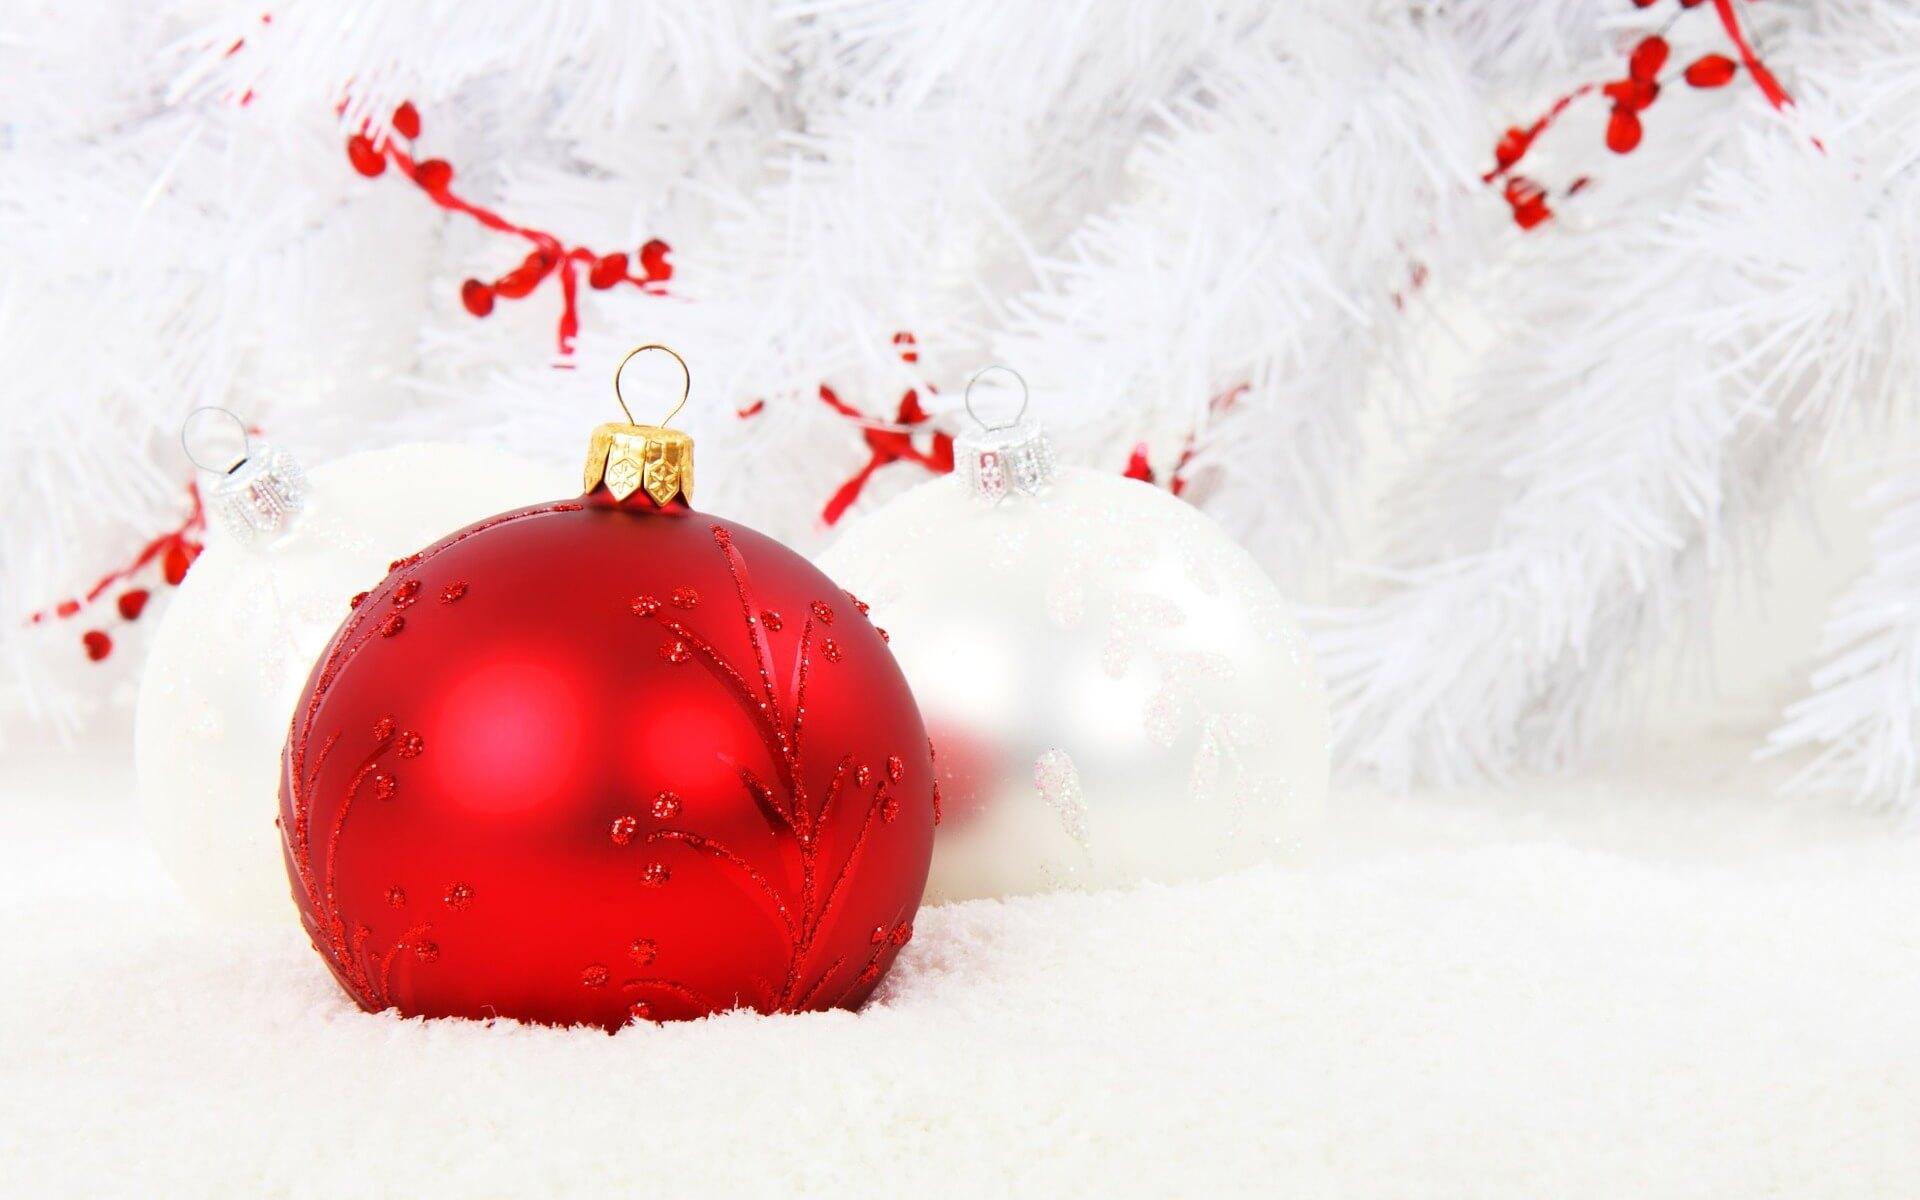 Weihnachtskugel (c) Pixabay